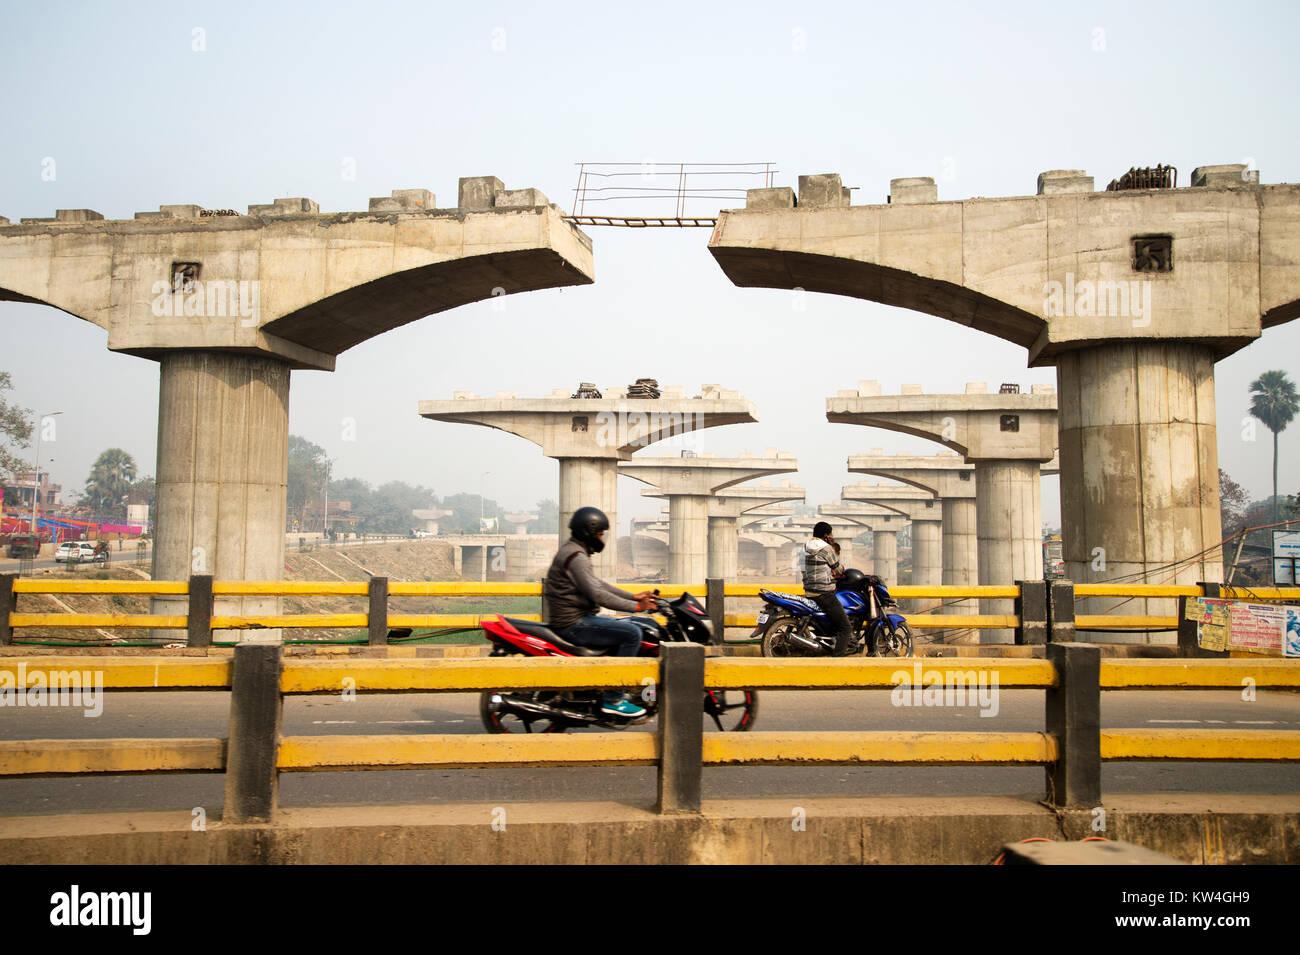 India. Bihar. Flyover construction. - Stock Image